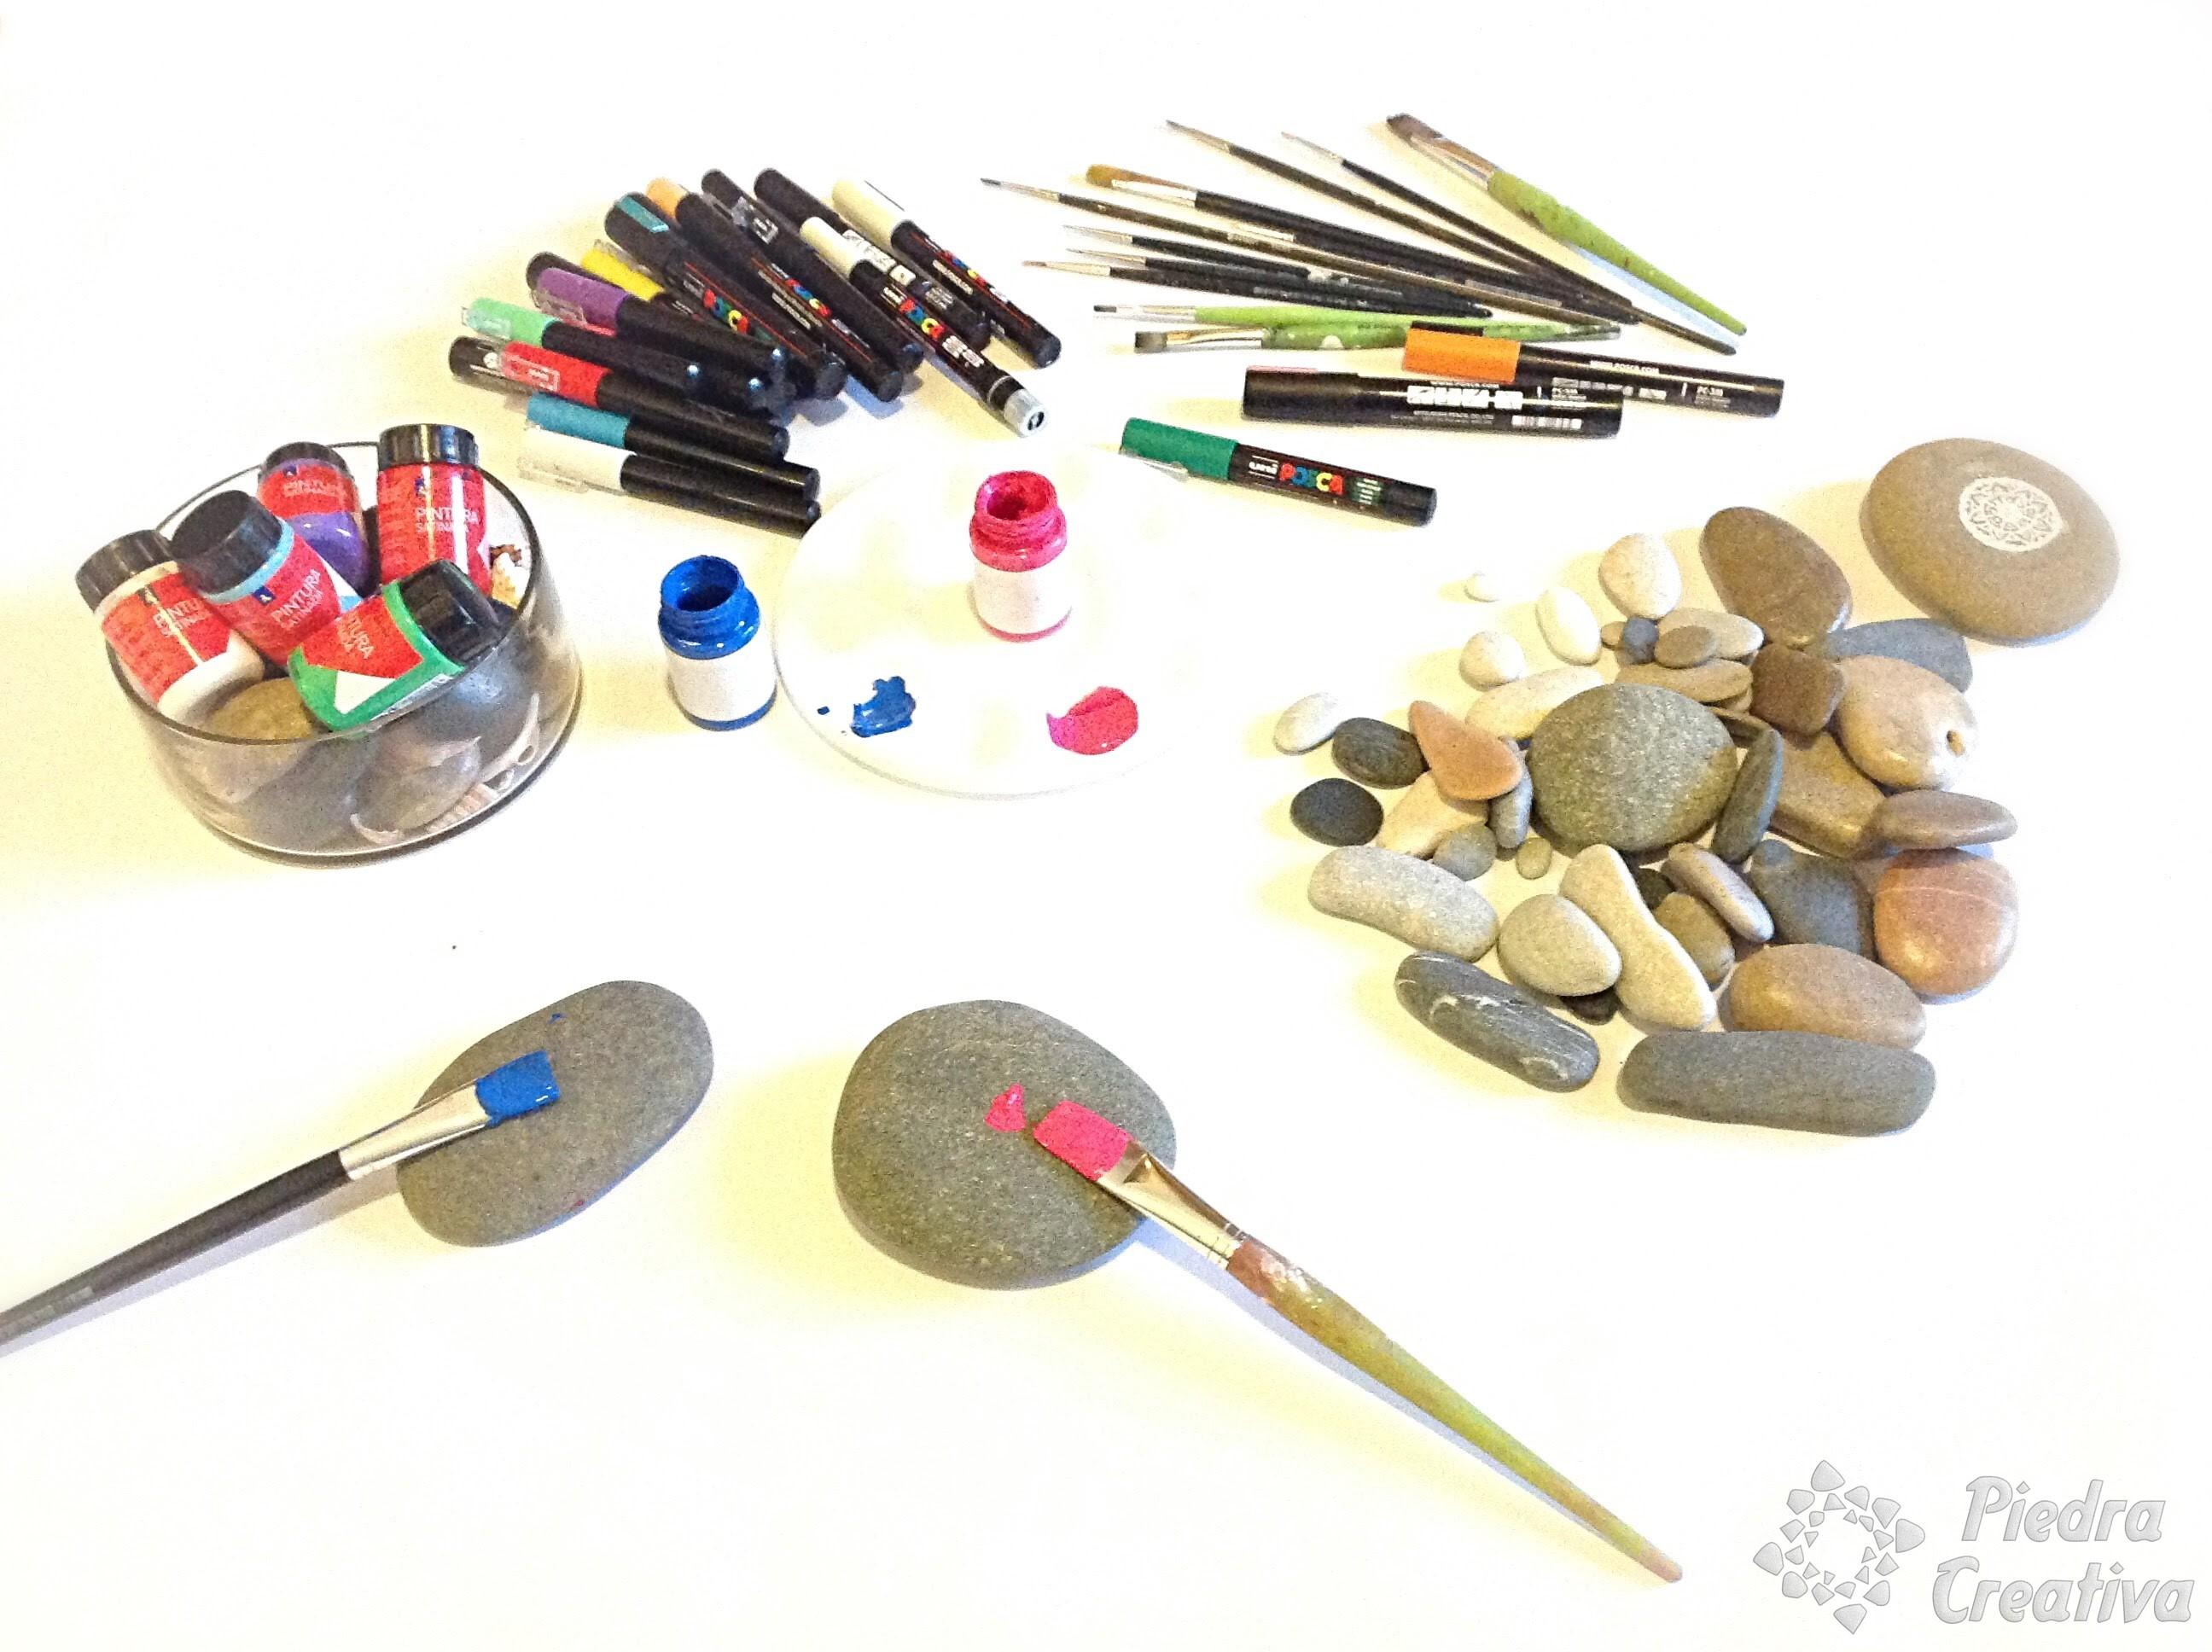 c mo pintar piedras para decorar tu hogar piedracreativa